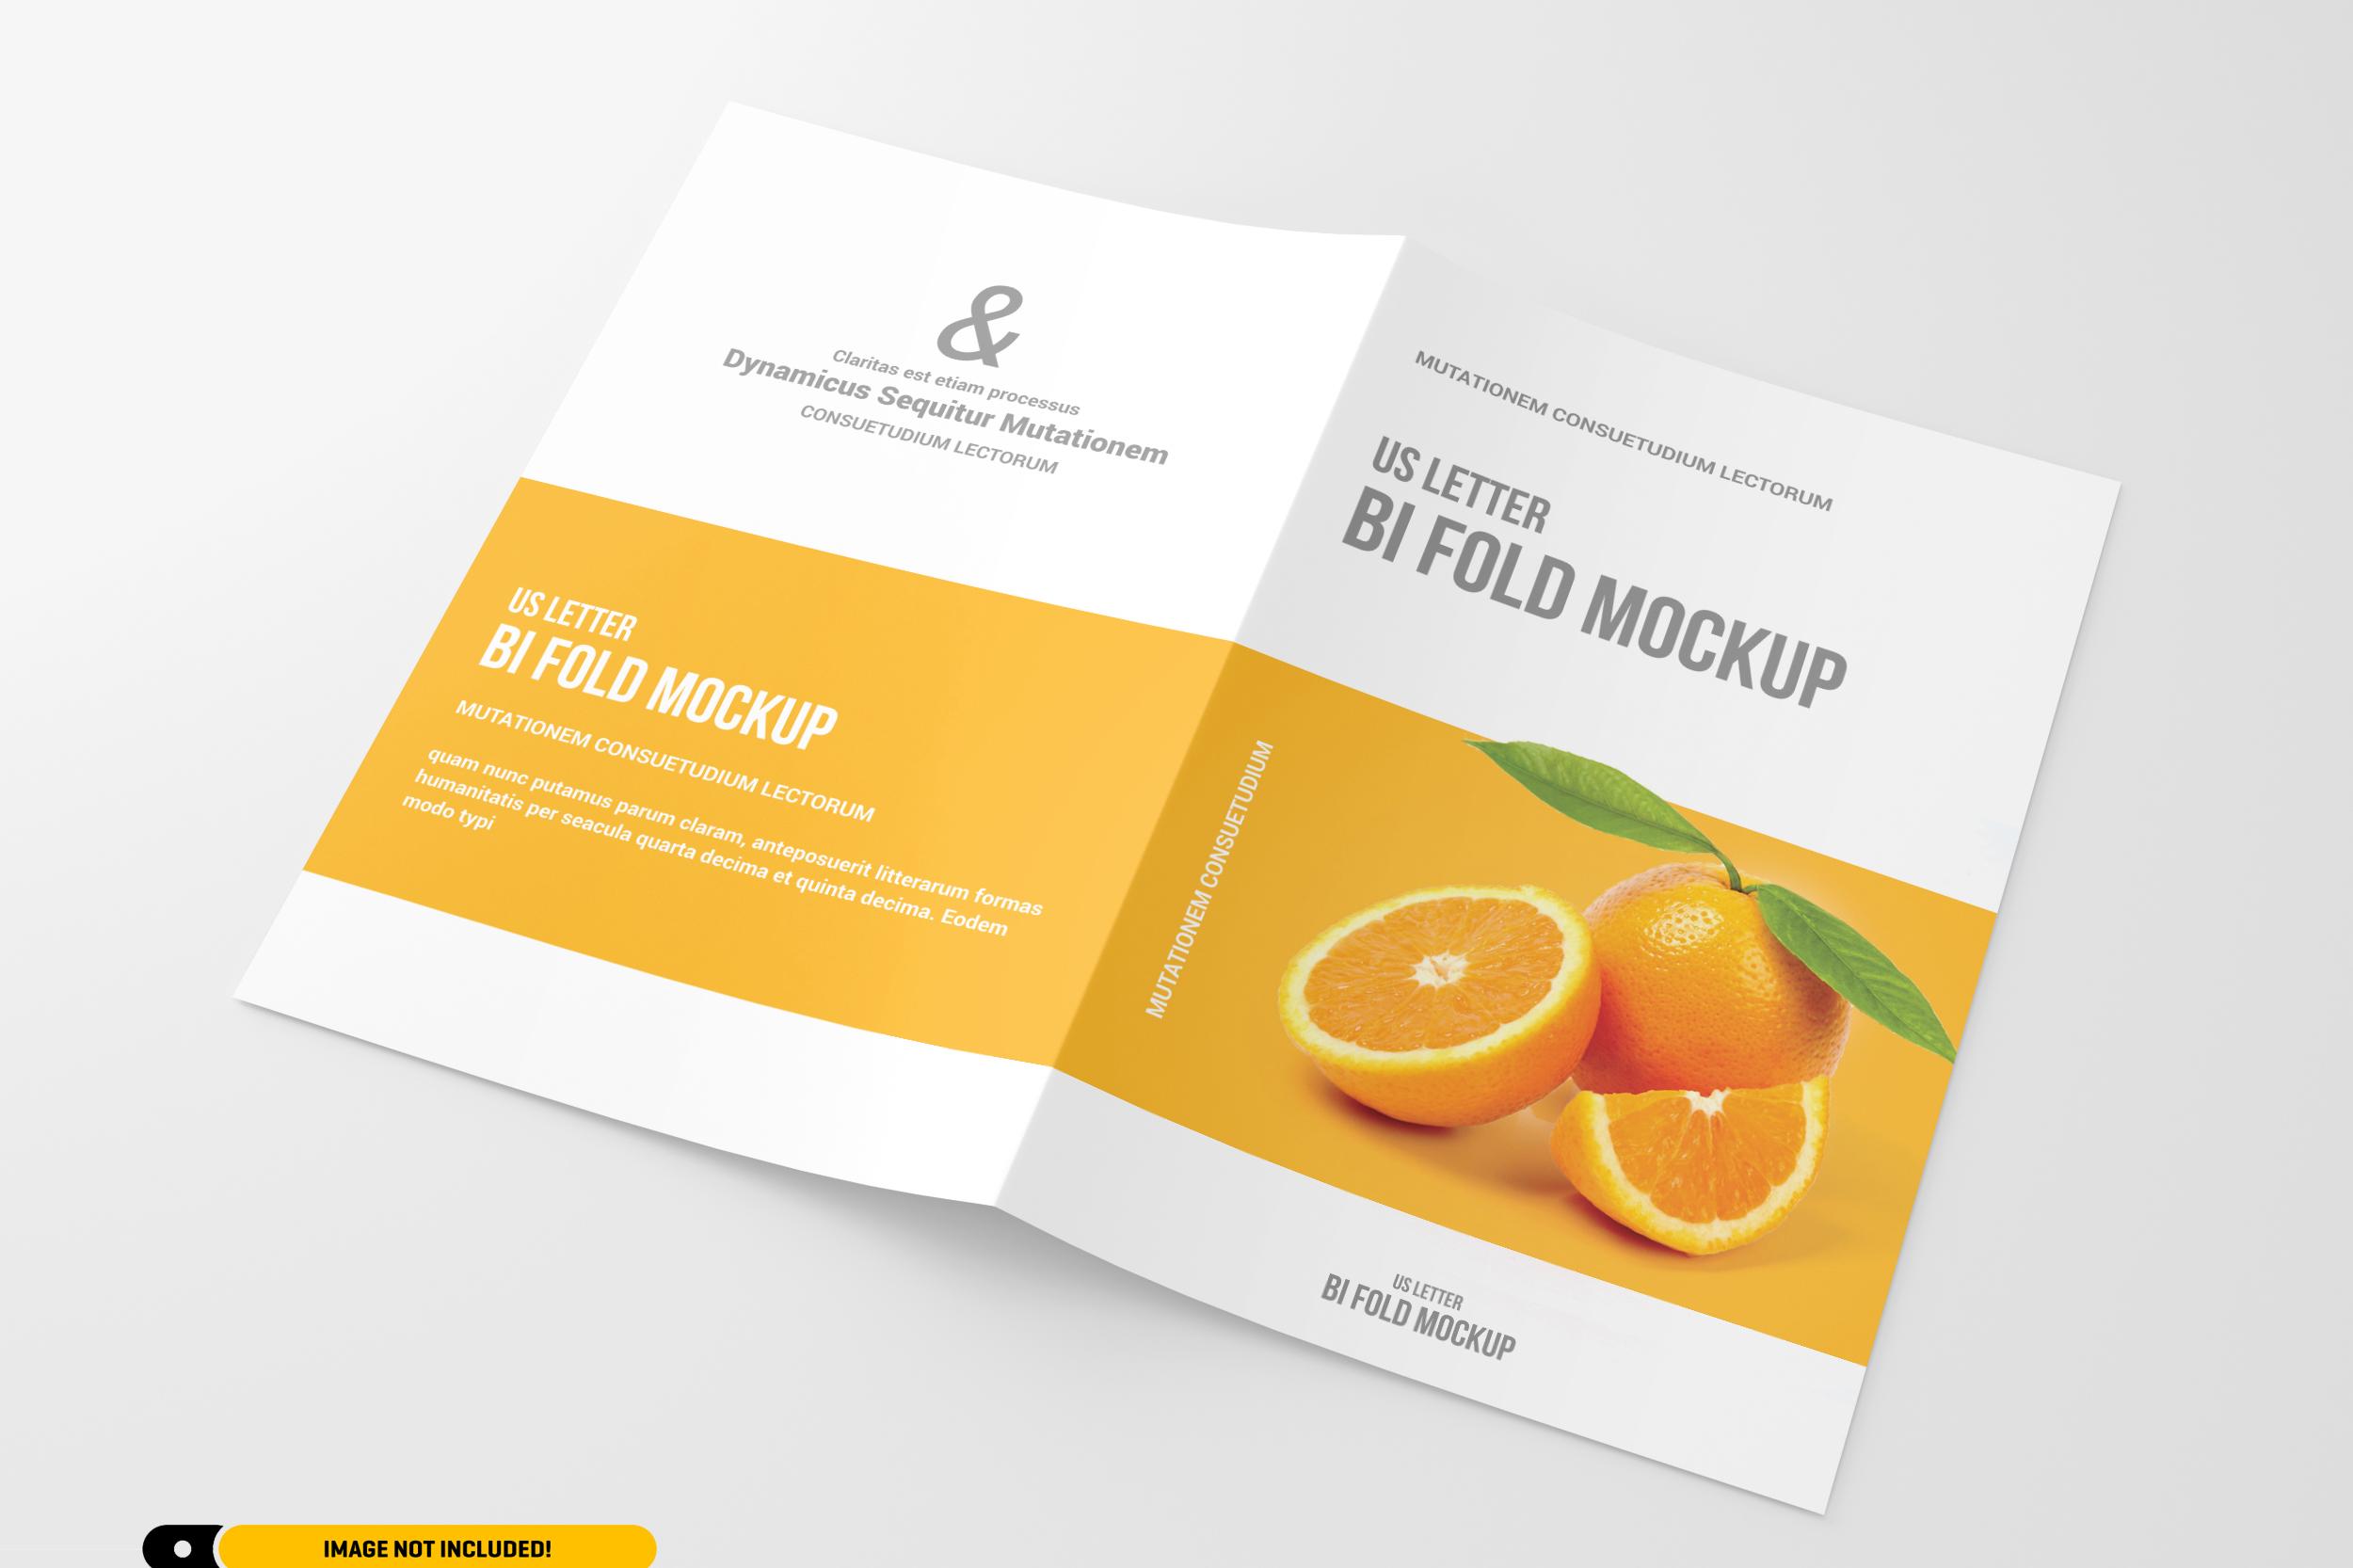 US Letter Bifold Brochure Mockup example image 5